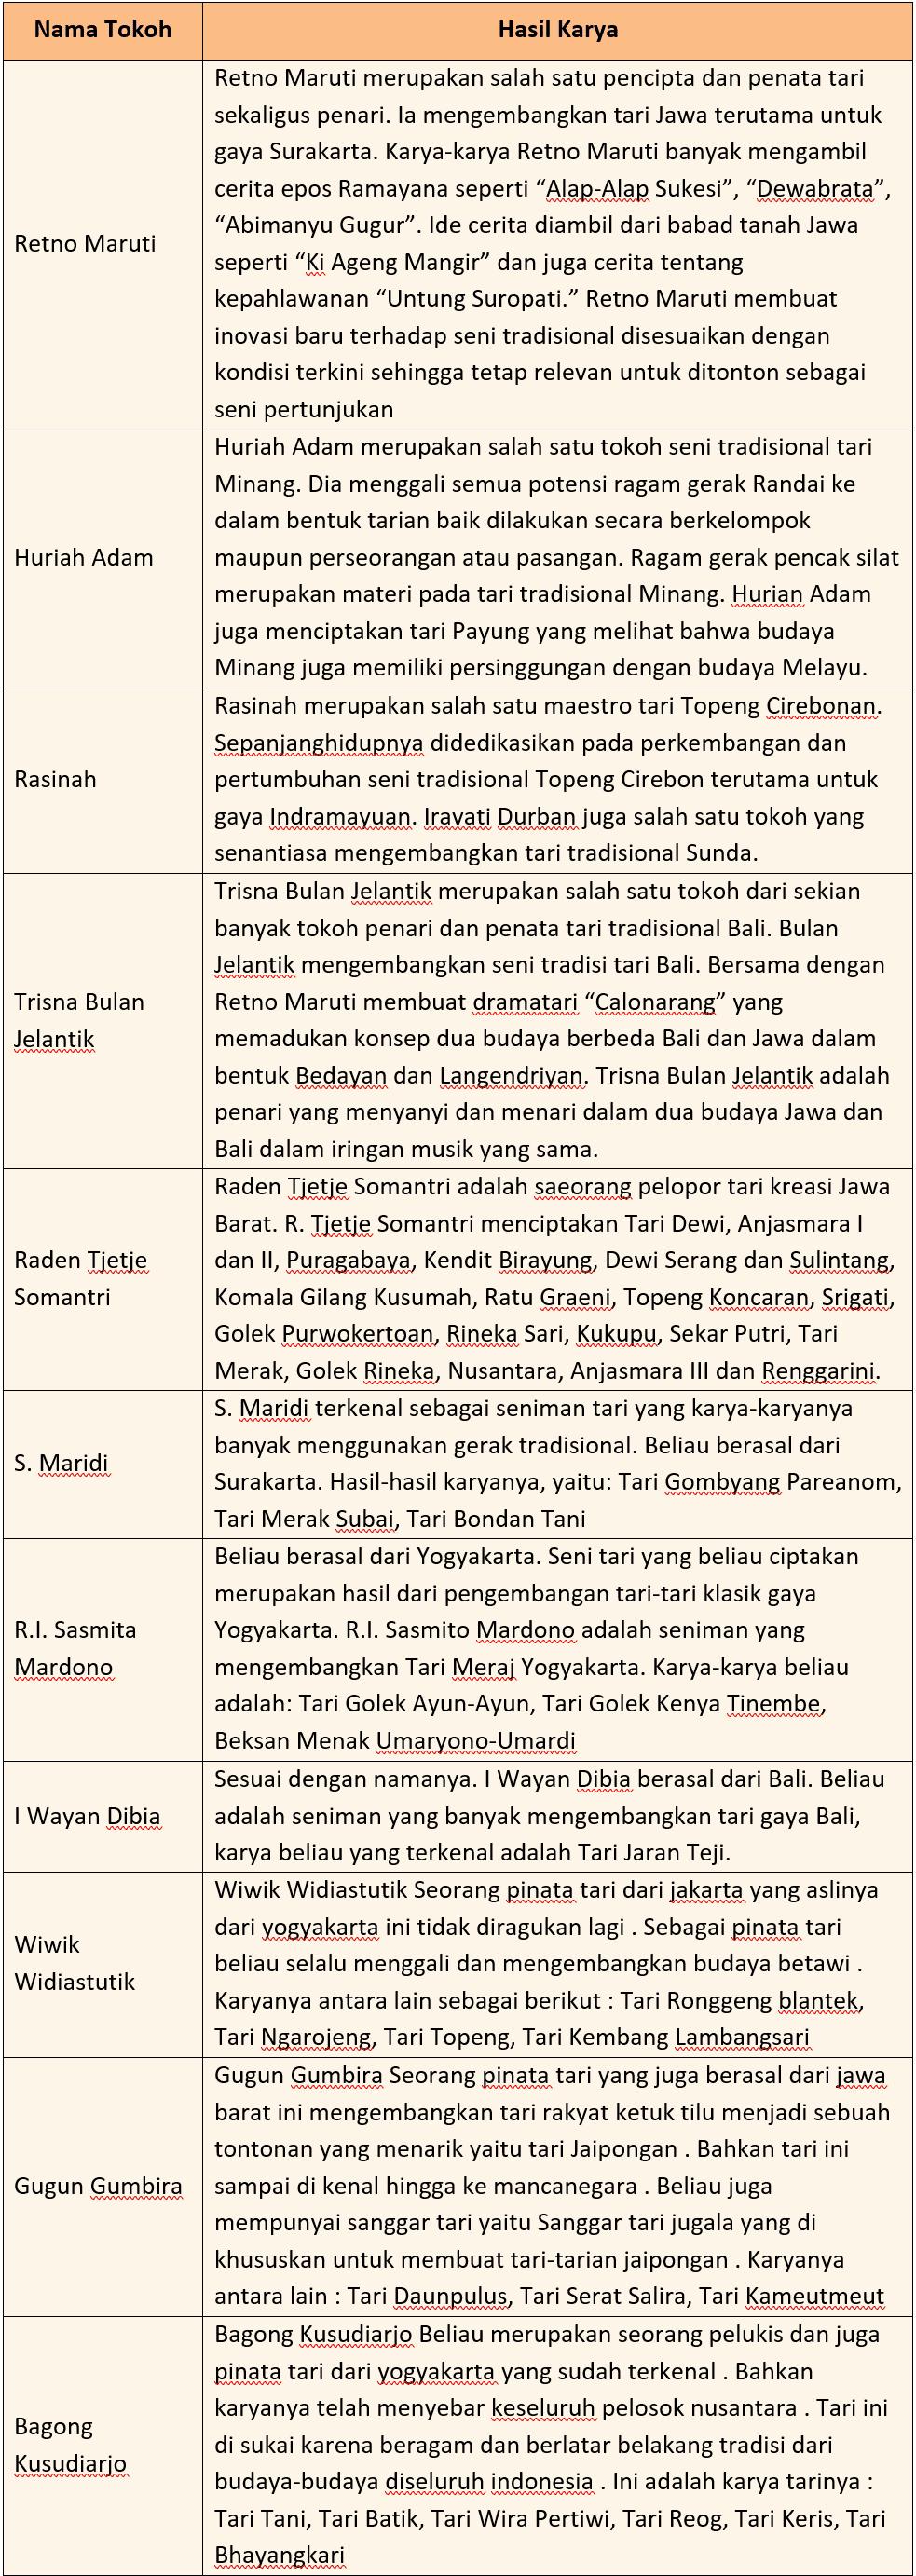 Kunci Jawaban Halaman 63, 71, 72 Tema 7 Kelas 6